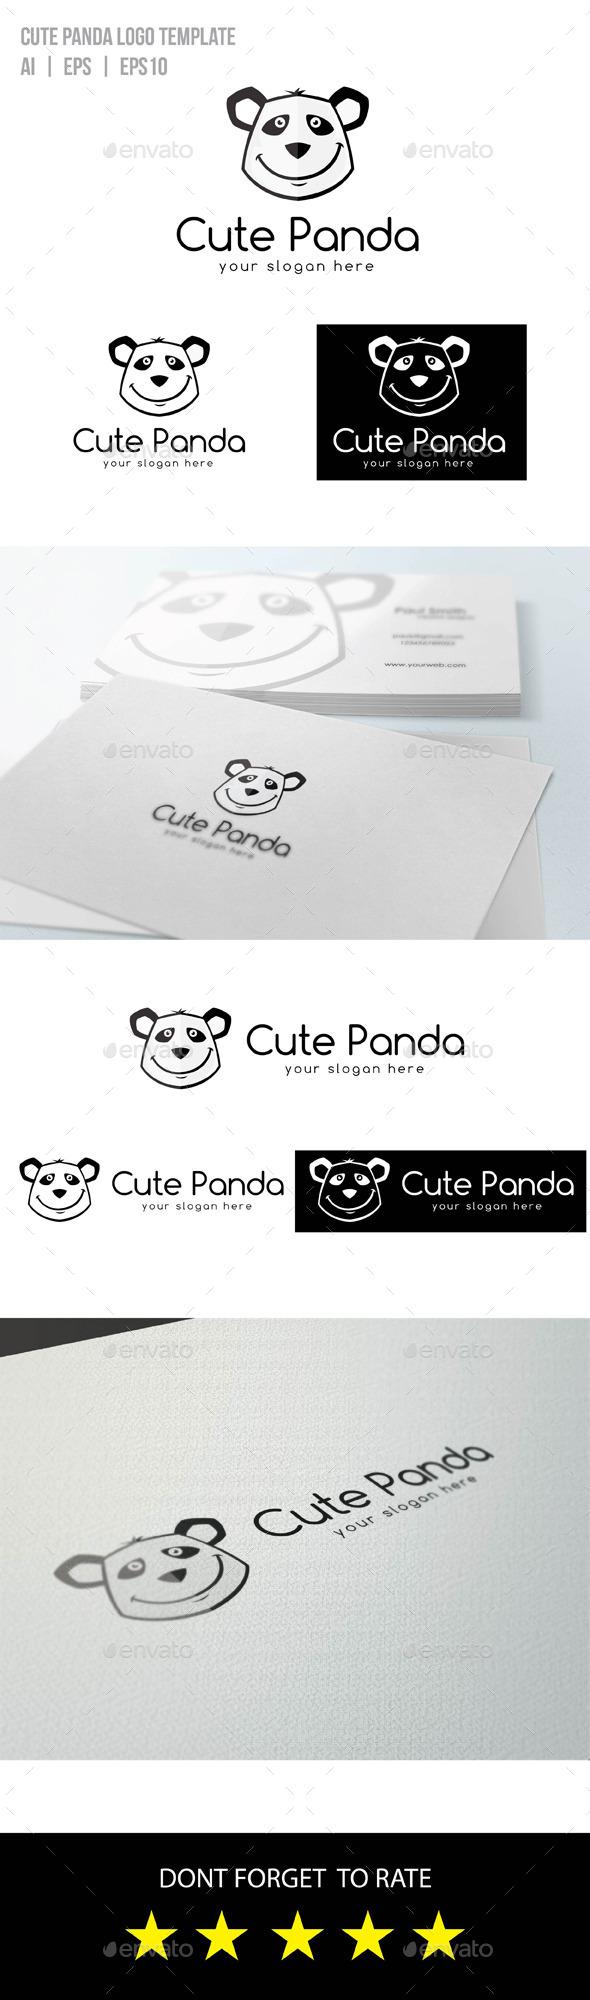 GraphicRiver Cute Panda Logo 9472350